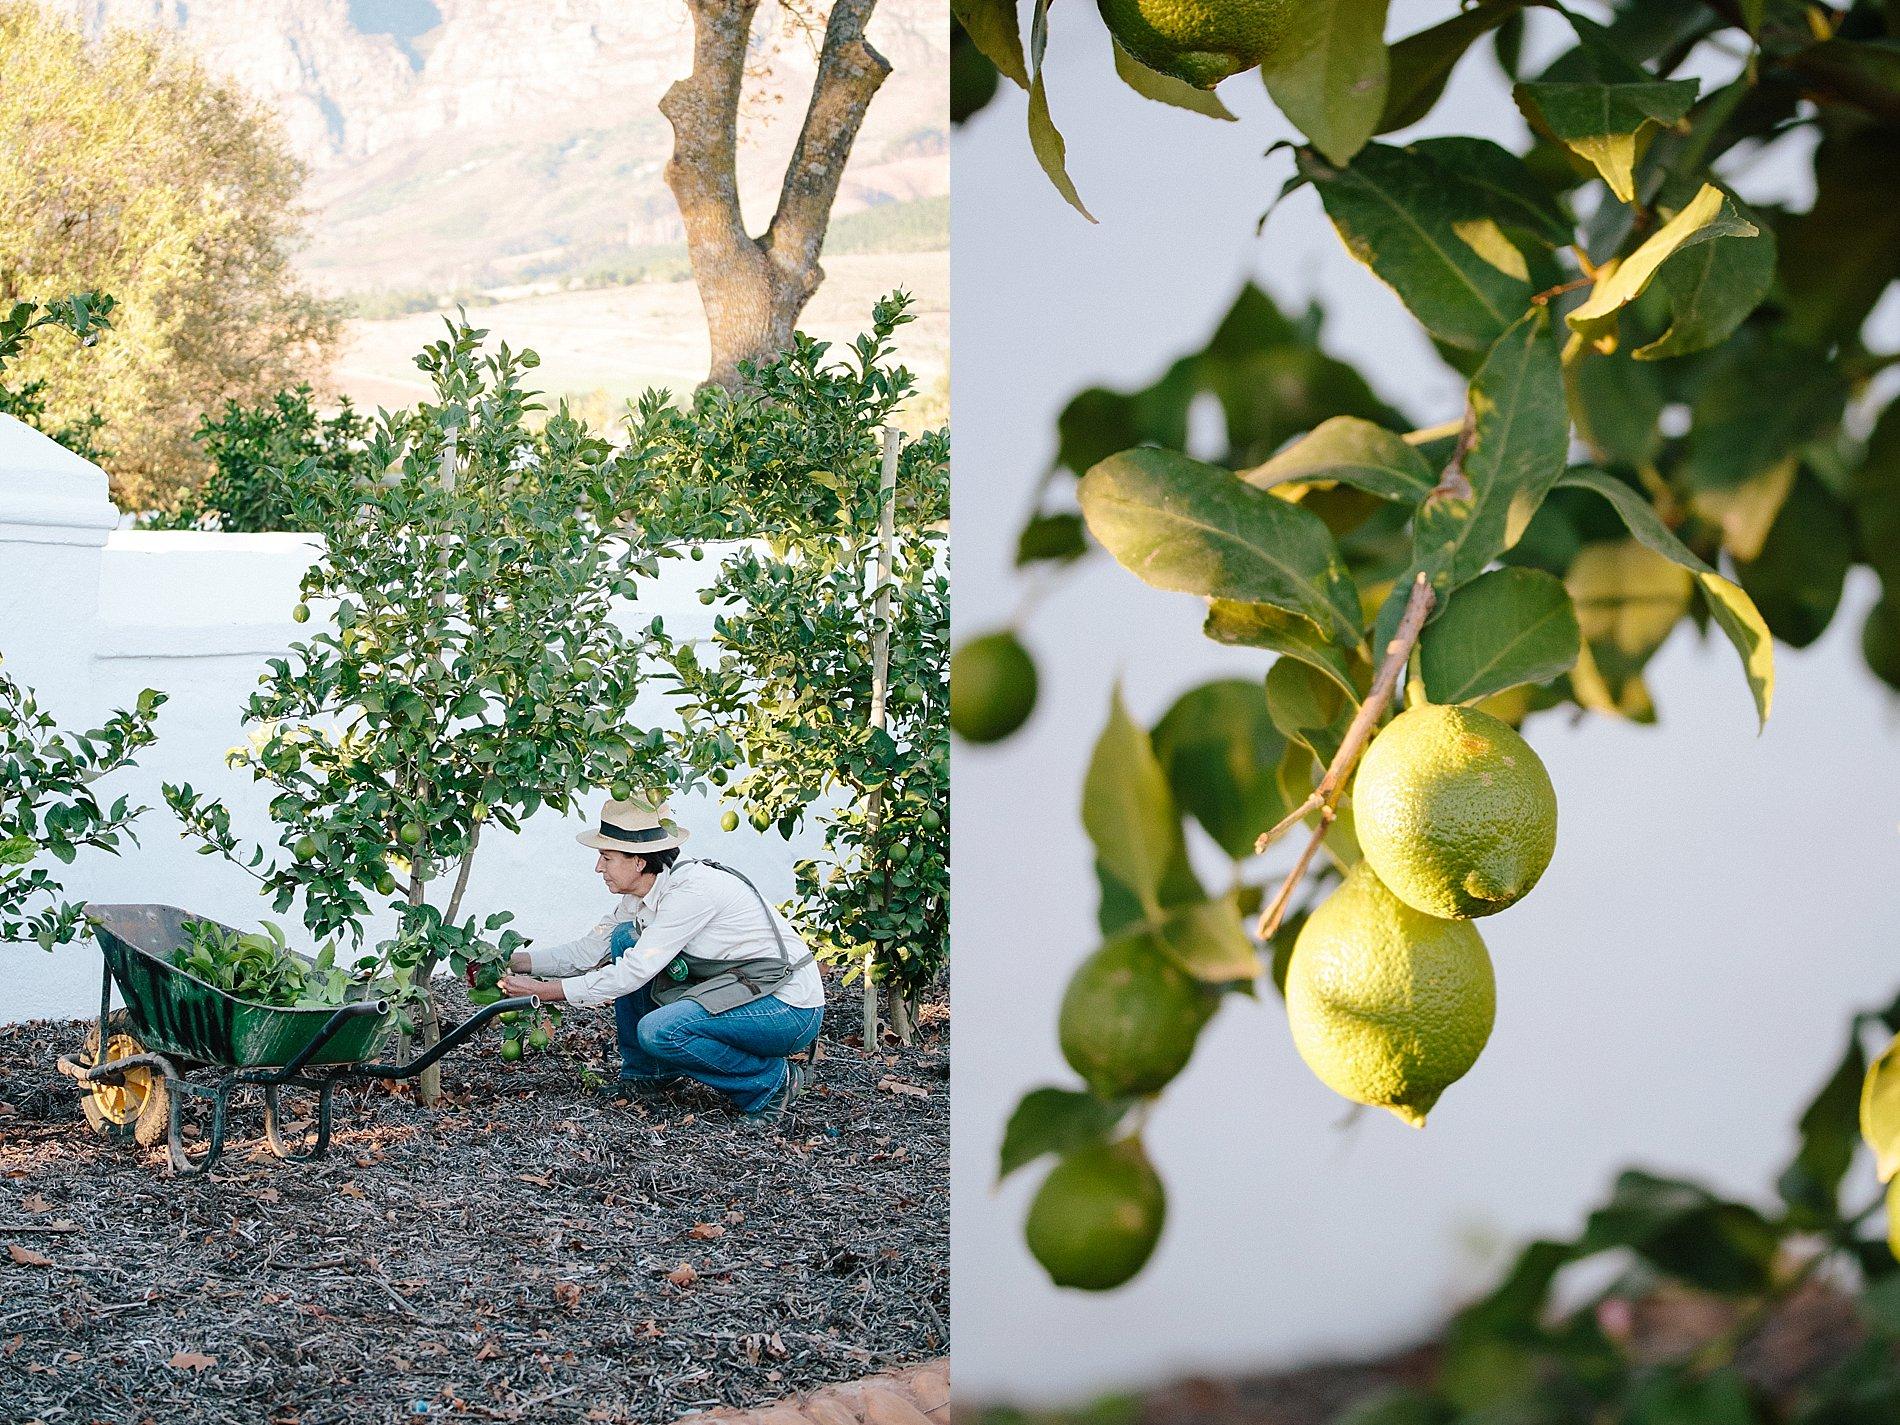 How to prune a lemon tree 0003 for Lemon plant images